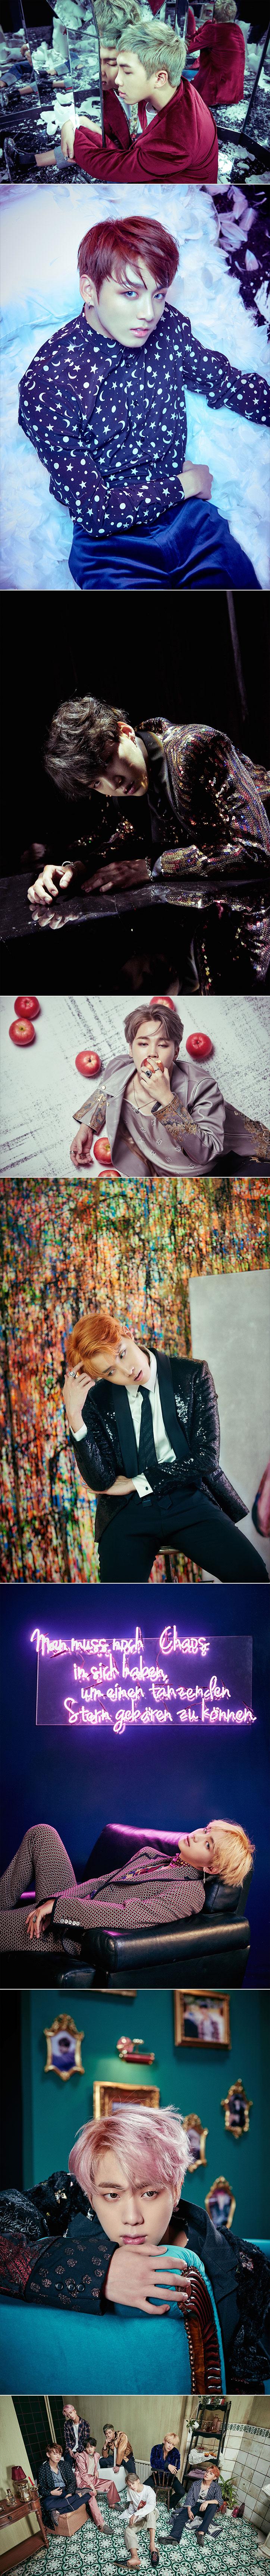 Rap Monster e Jungkook para Full Álbum 'WINGS' - BTS ❤